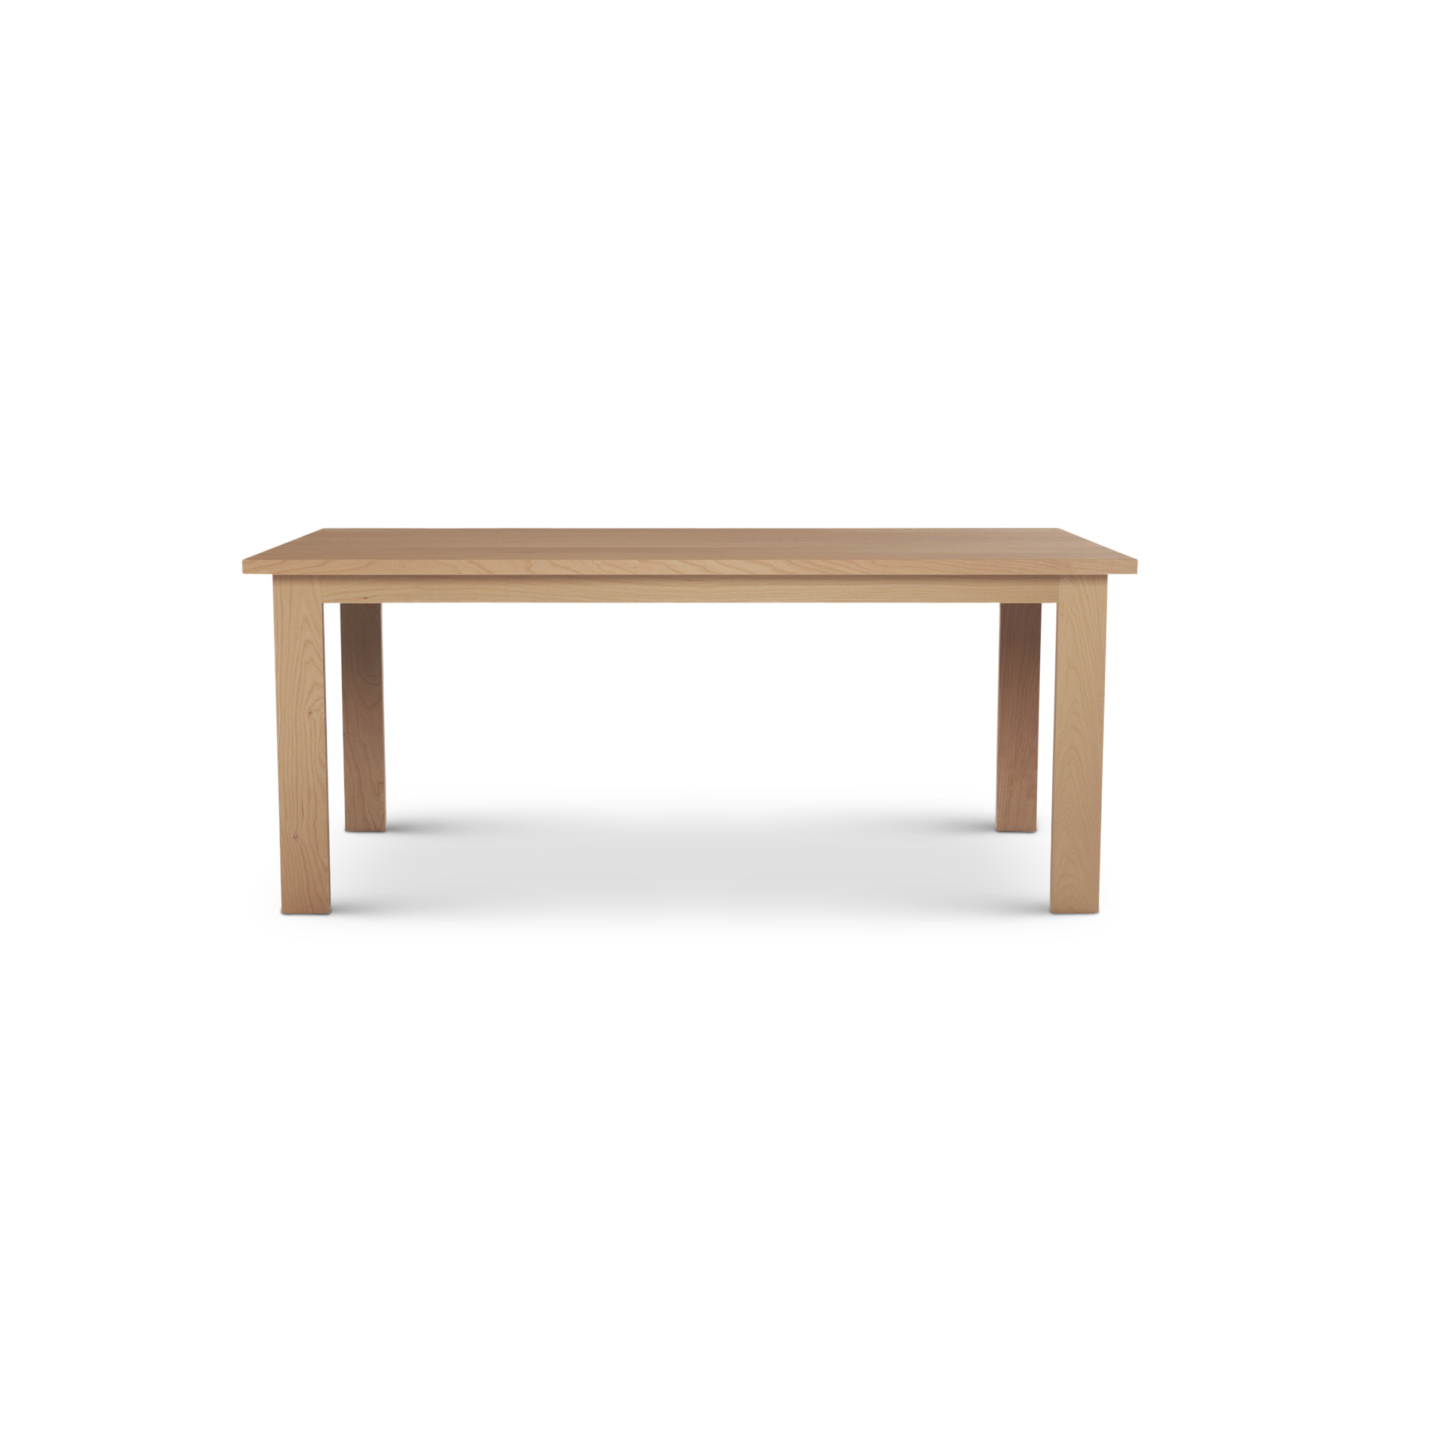 Scandinavian 6 foot kitchen table